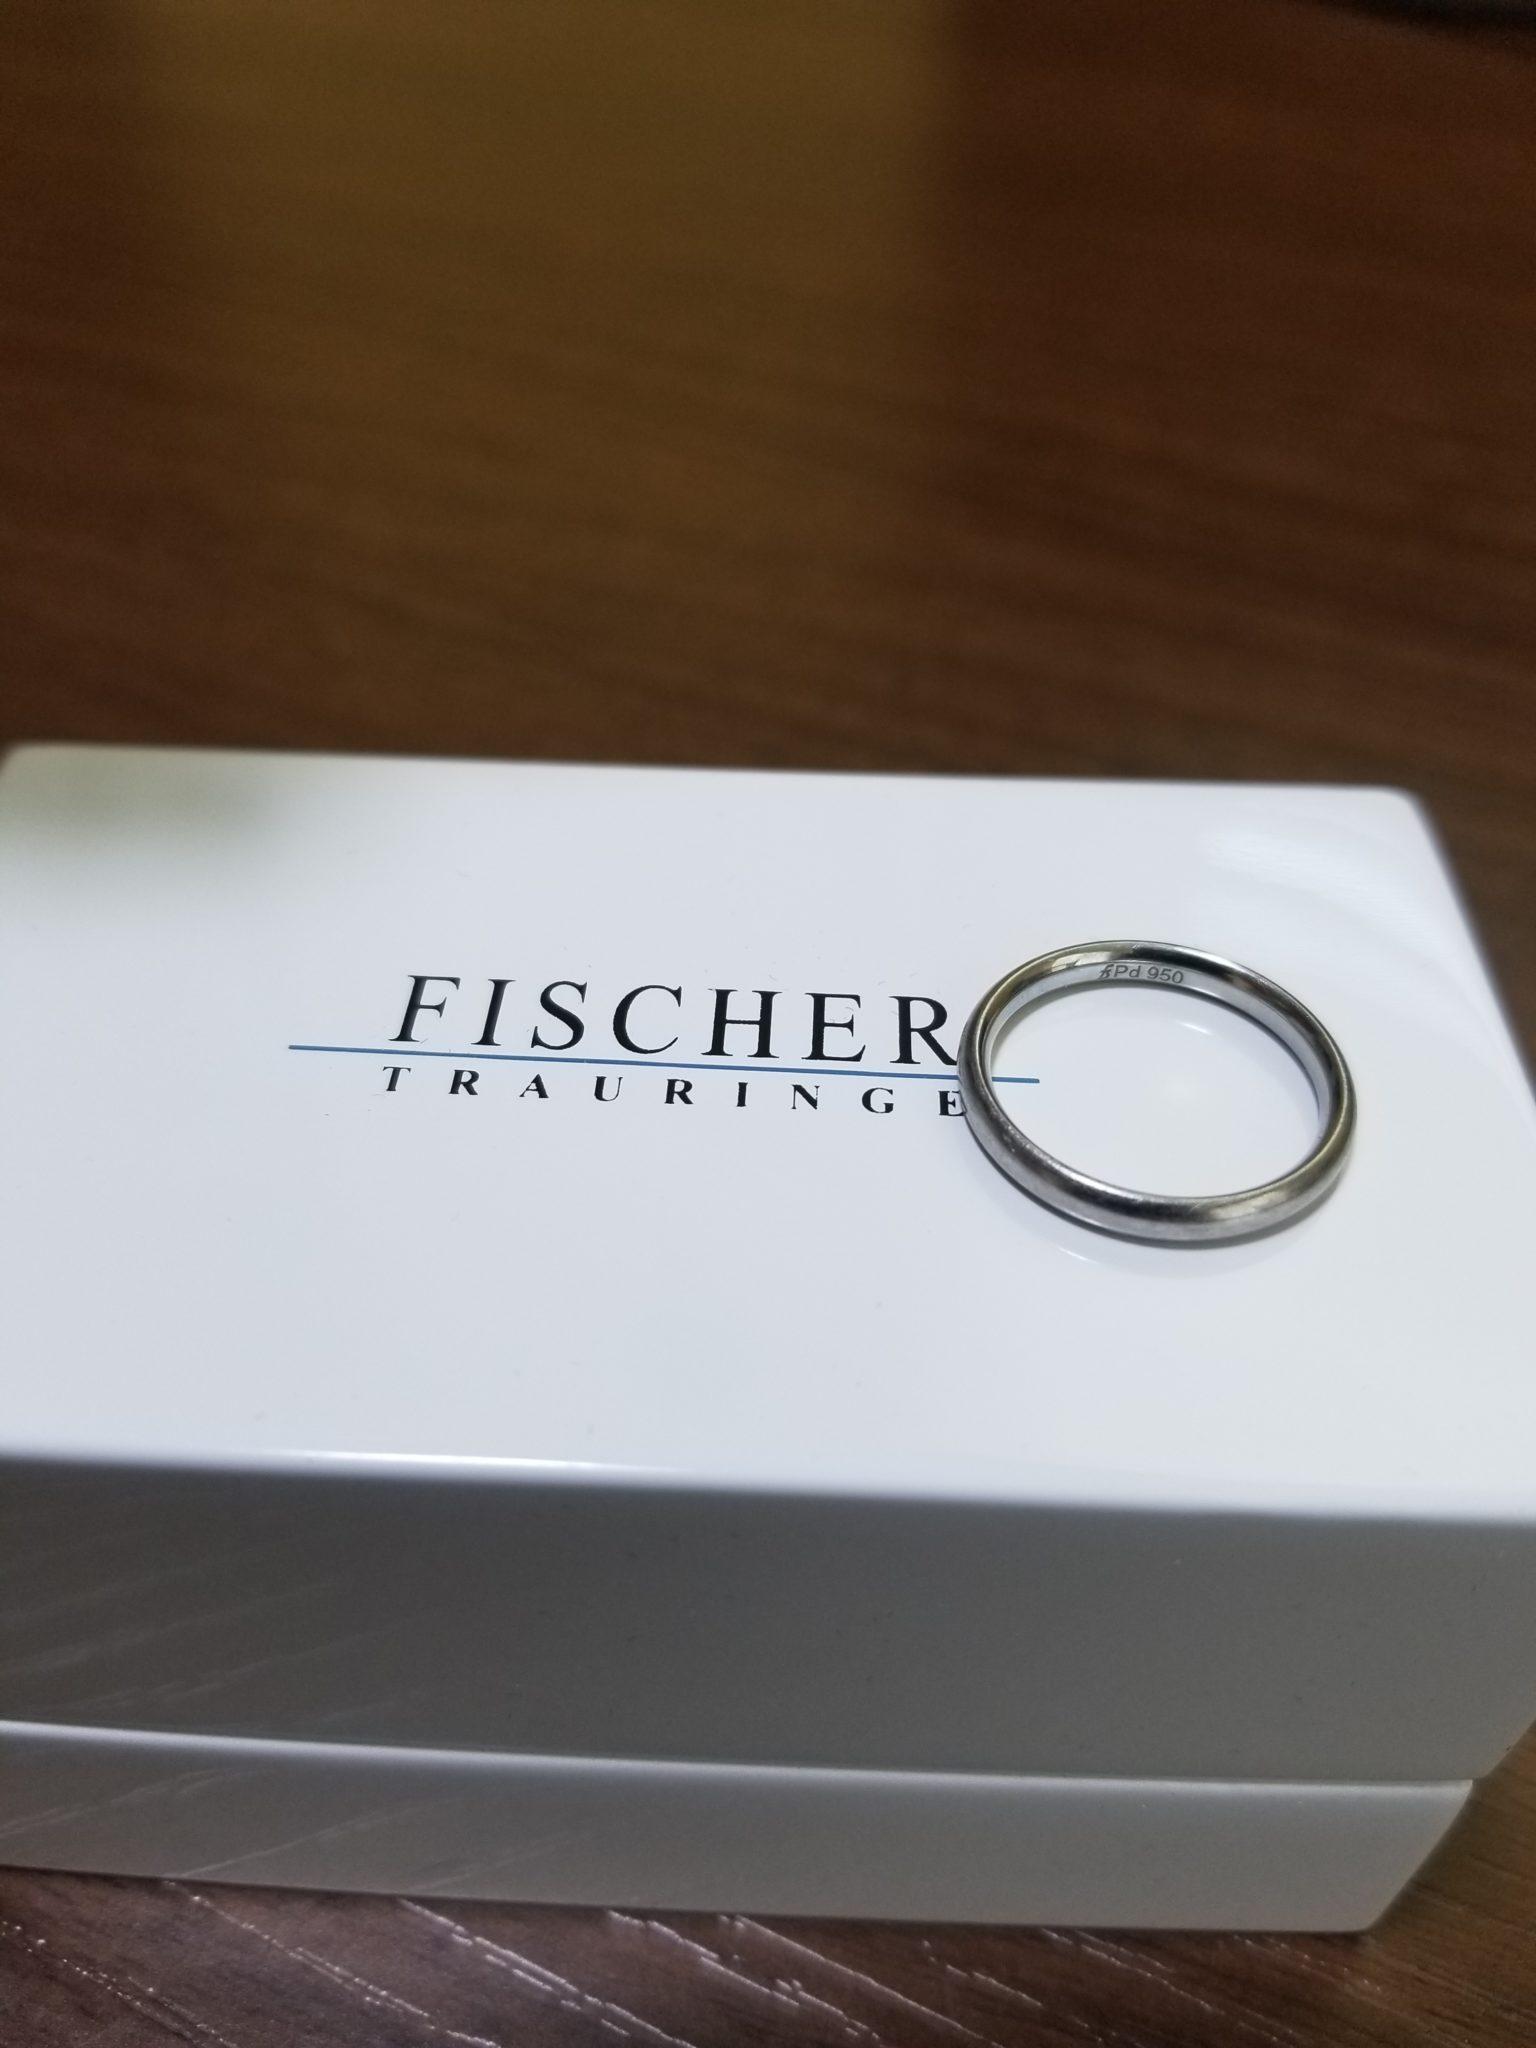 FISCHER(フィッシャー)の結婚指輪1